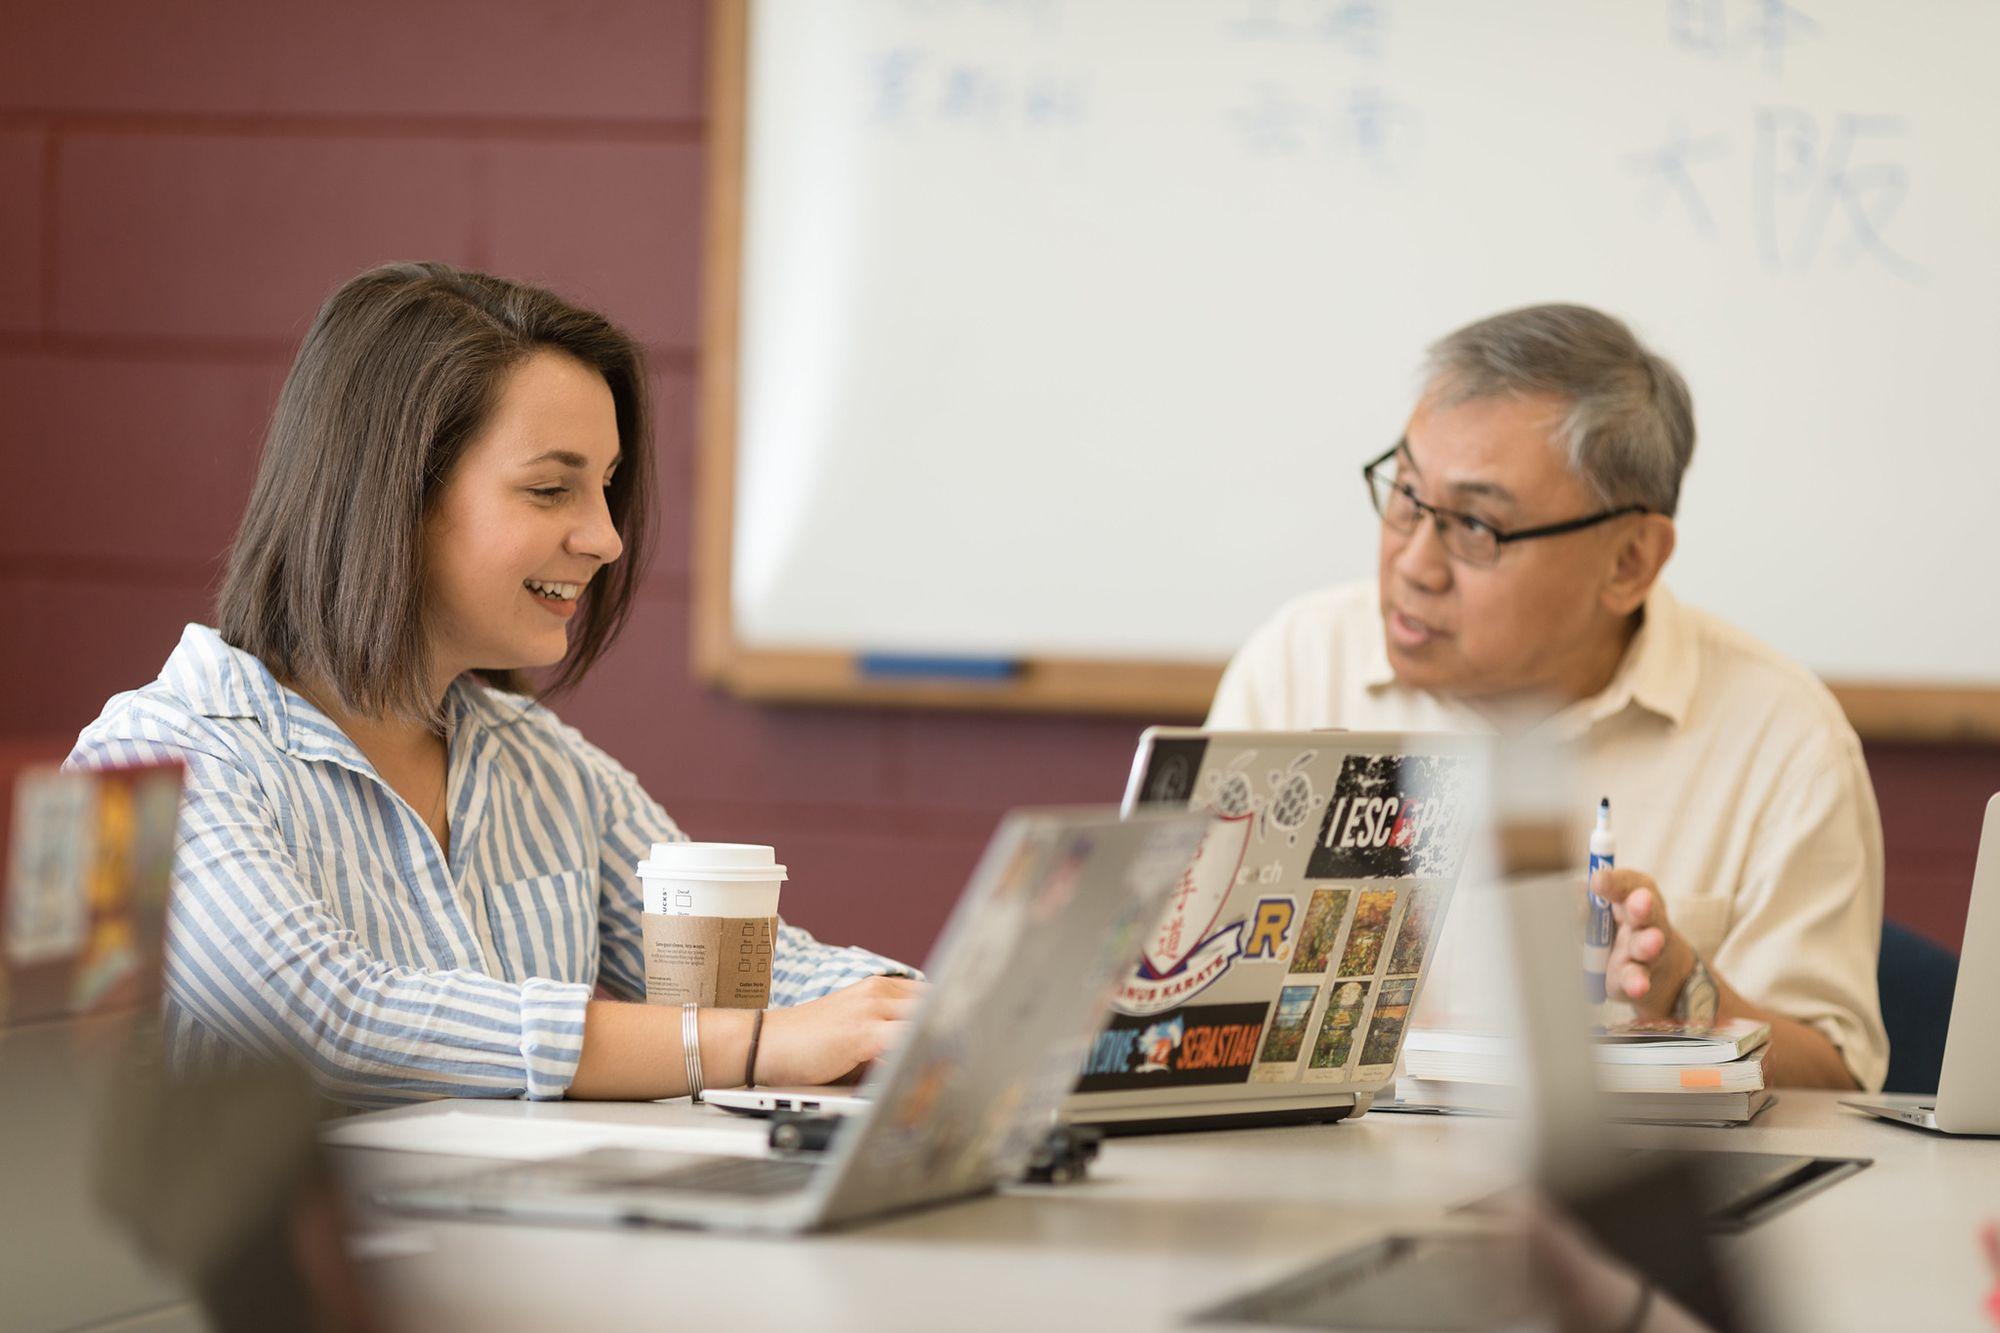 Karina Barbesino talking with her professor